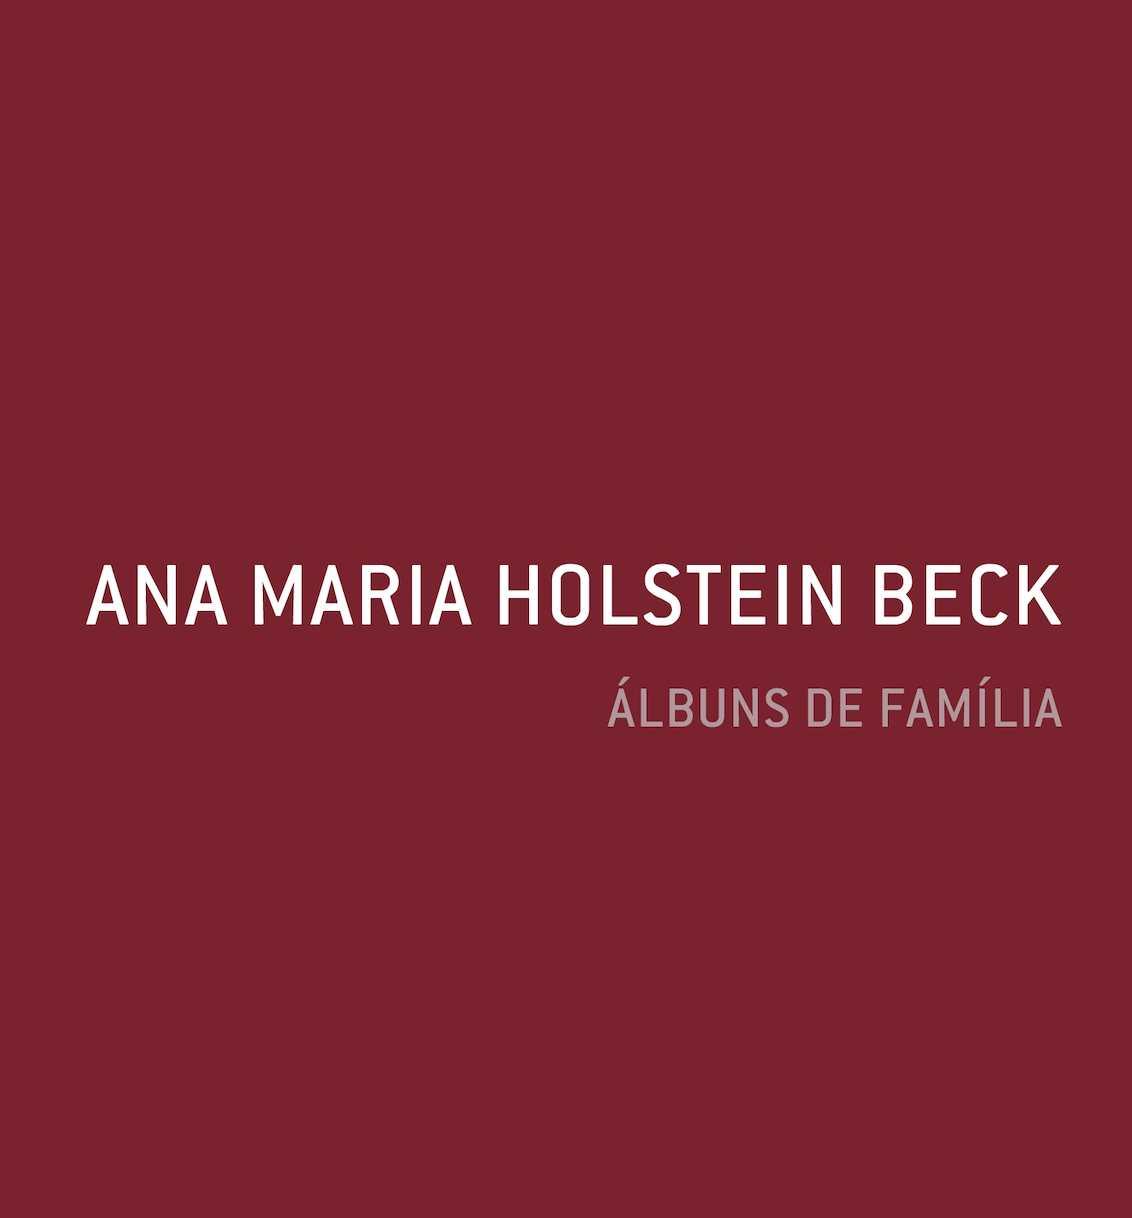 6ccc8874de3 Calaméo - Ana Maria Holstein Beck - Álbuns de Família